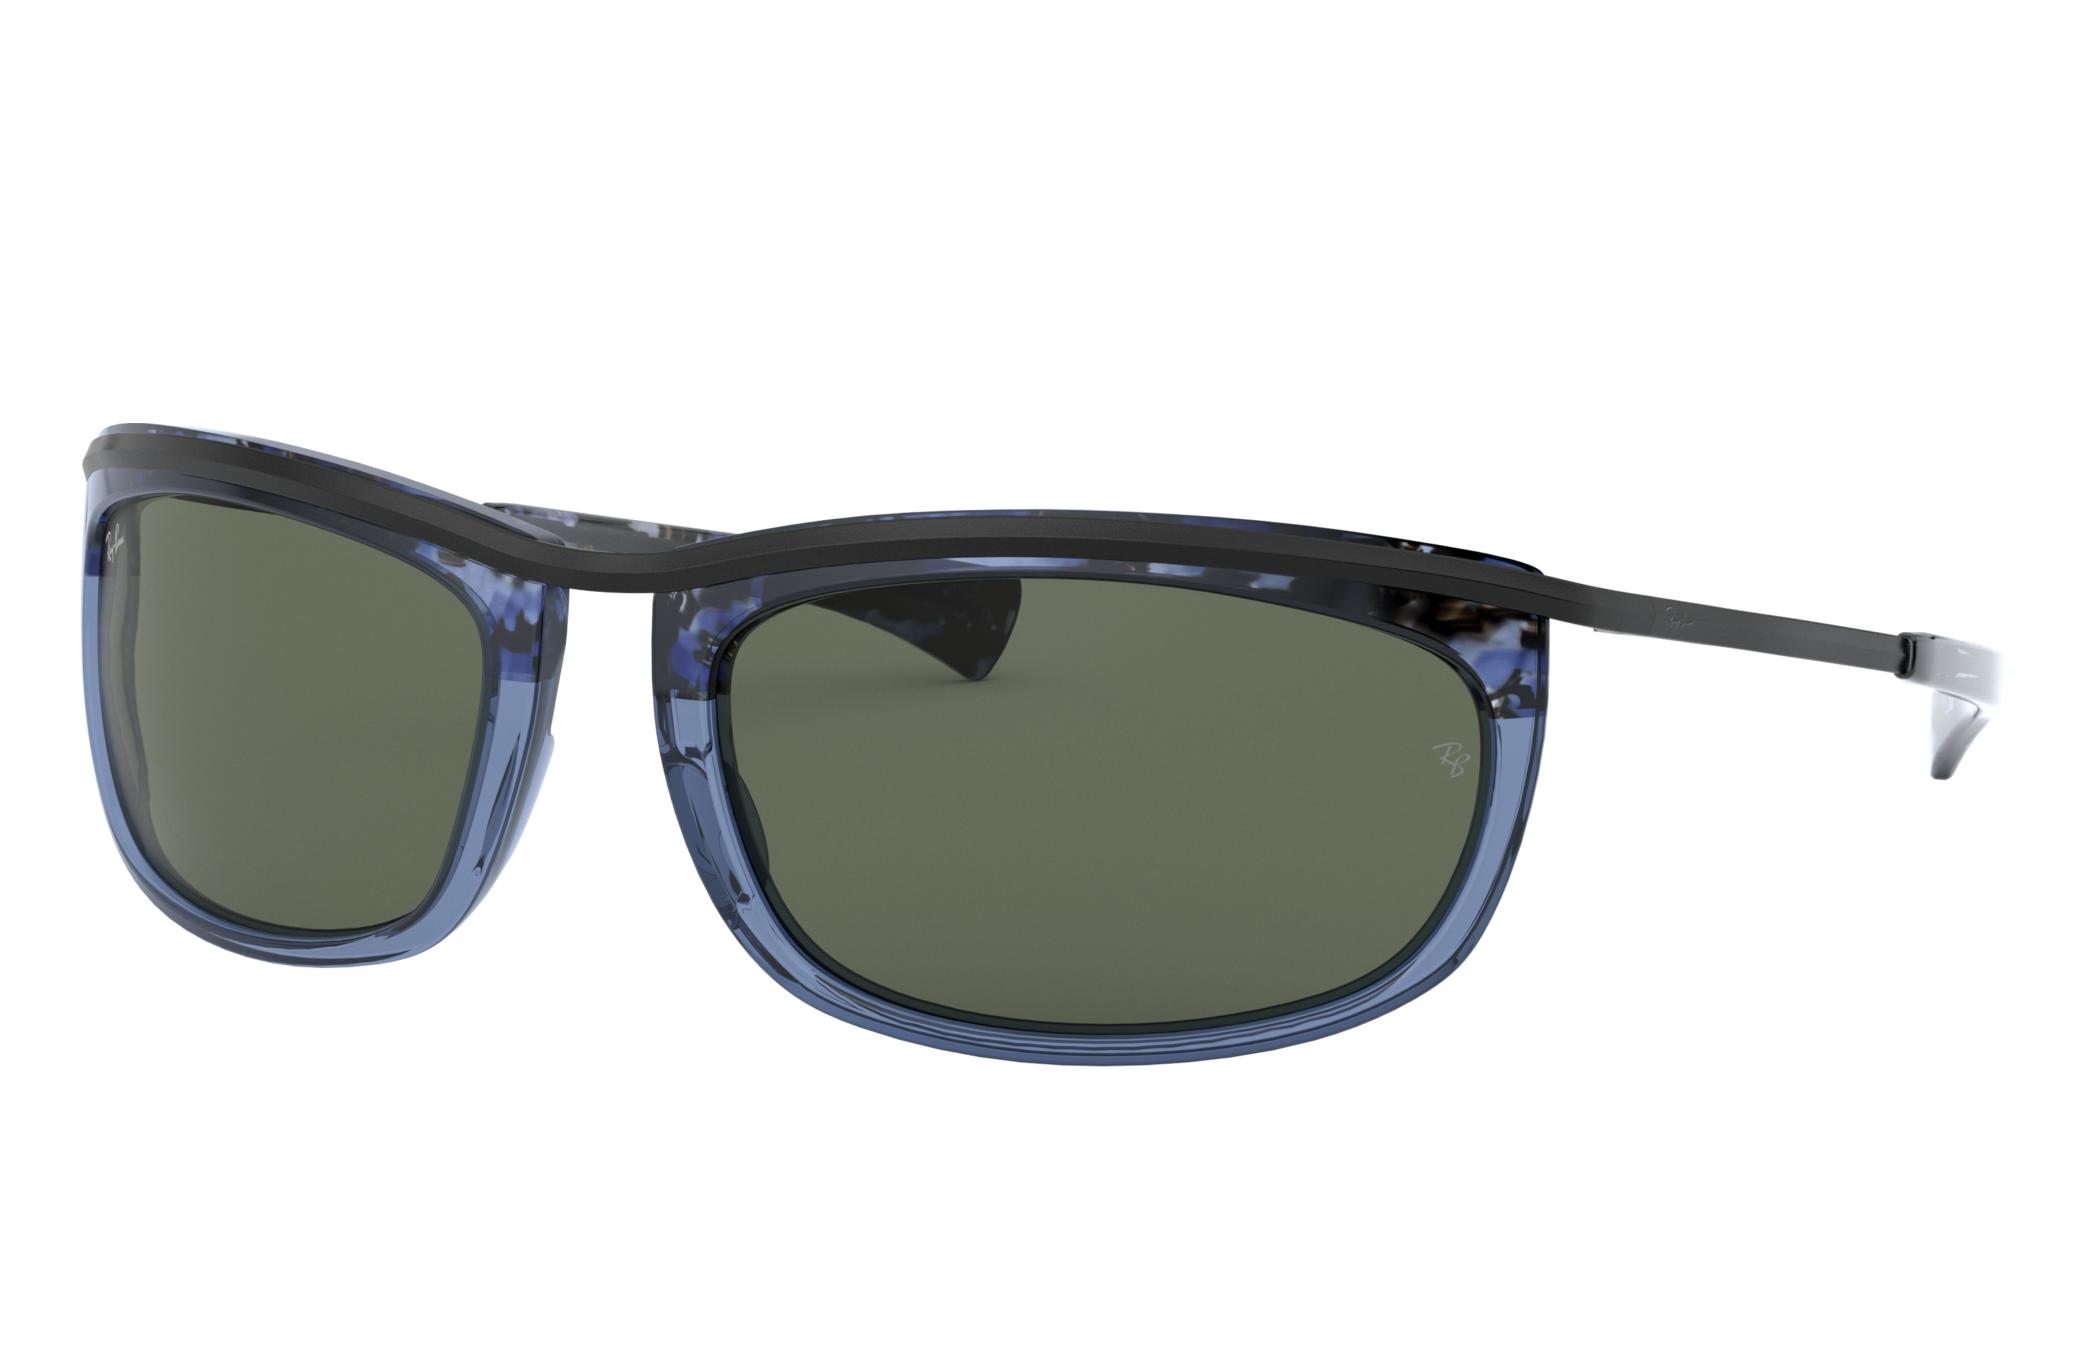 Ray-Ban Olympian I Blue, Green Lenses - RB2319